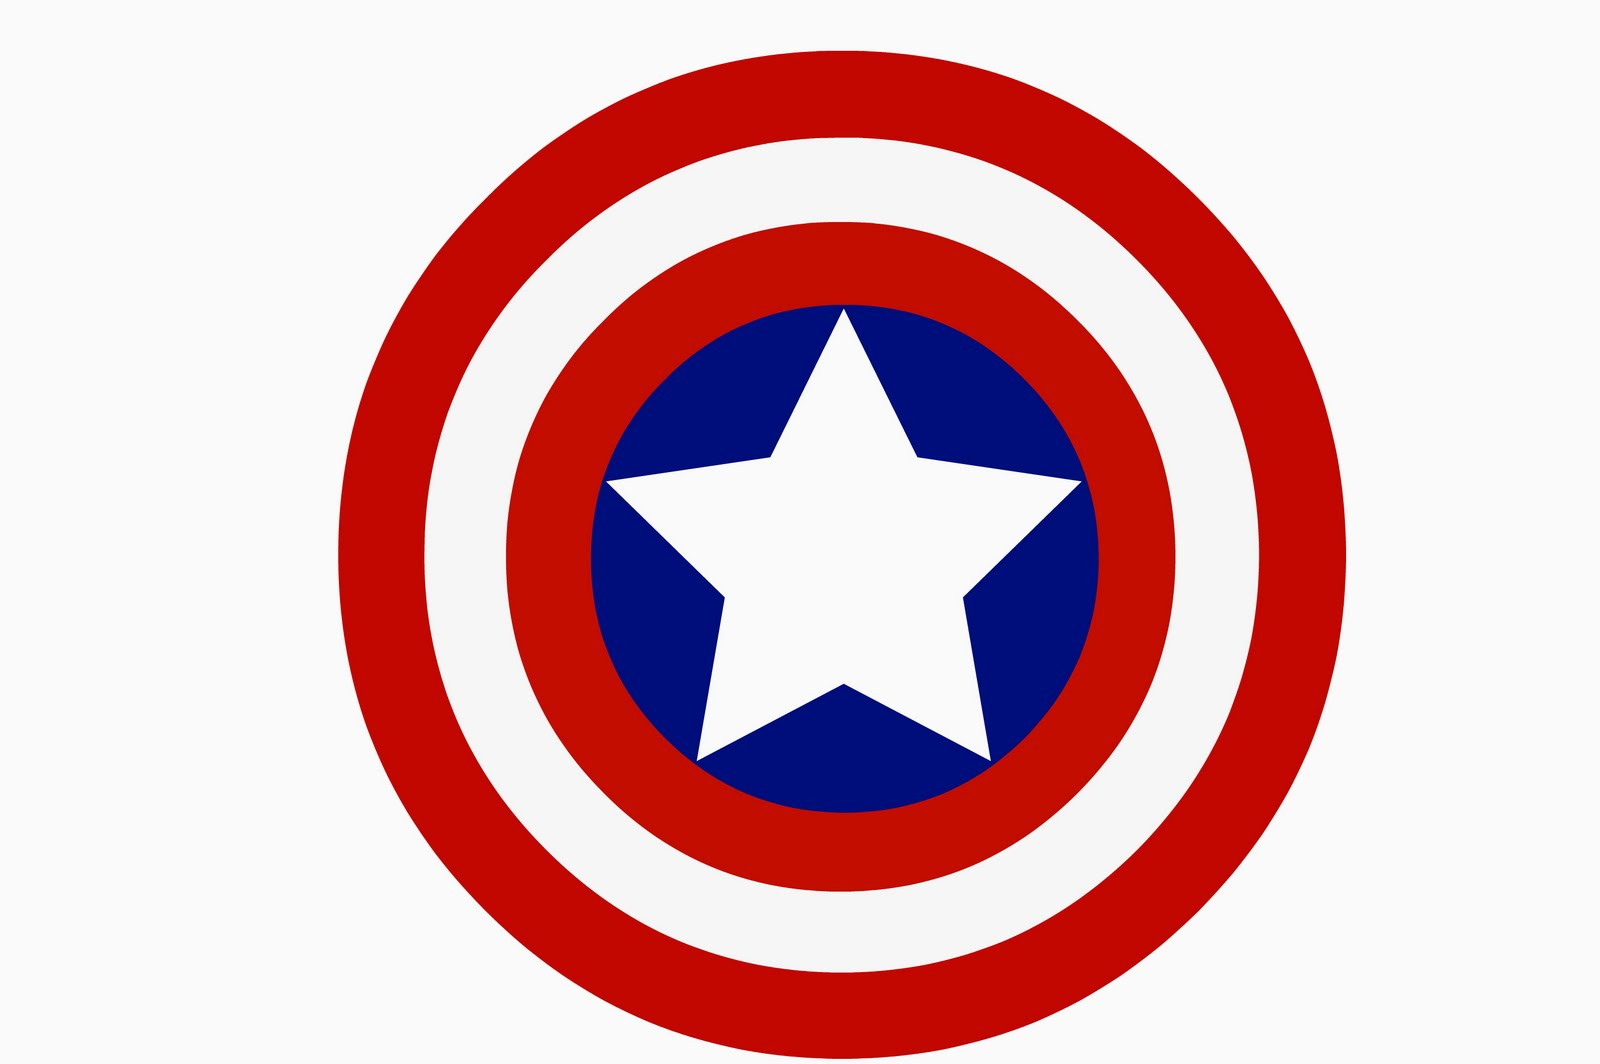 Captain America Clip Art - ClipArt Best Captain America Logo Clip Art